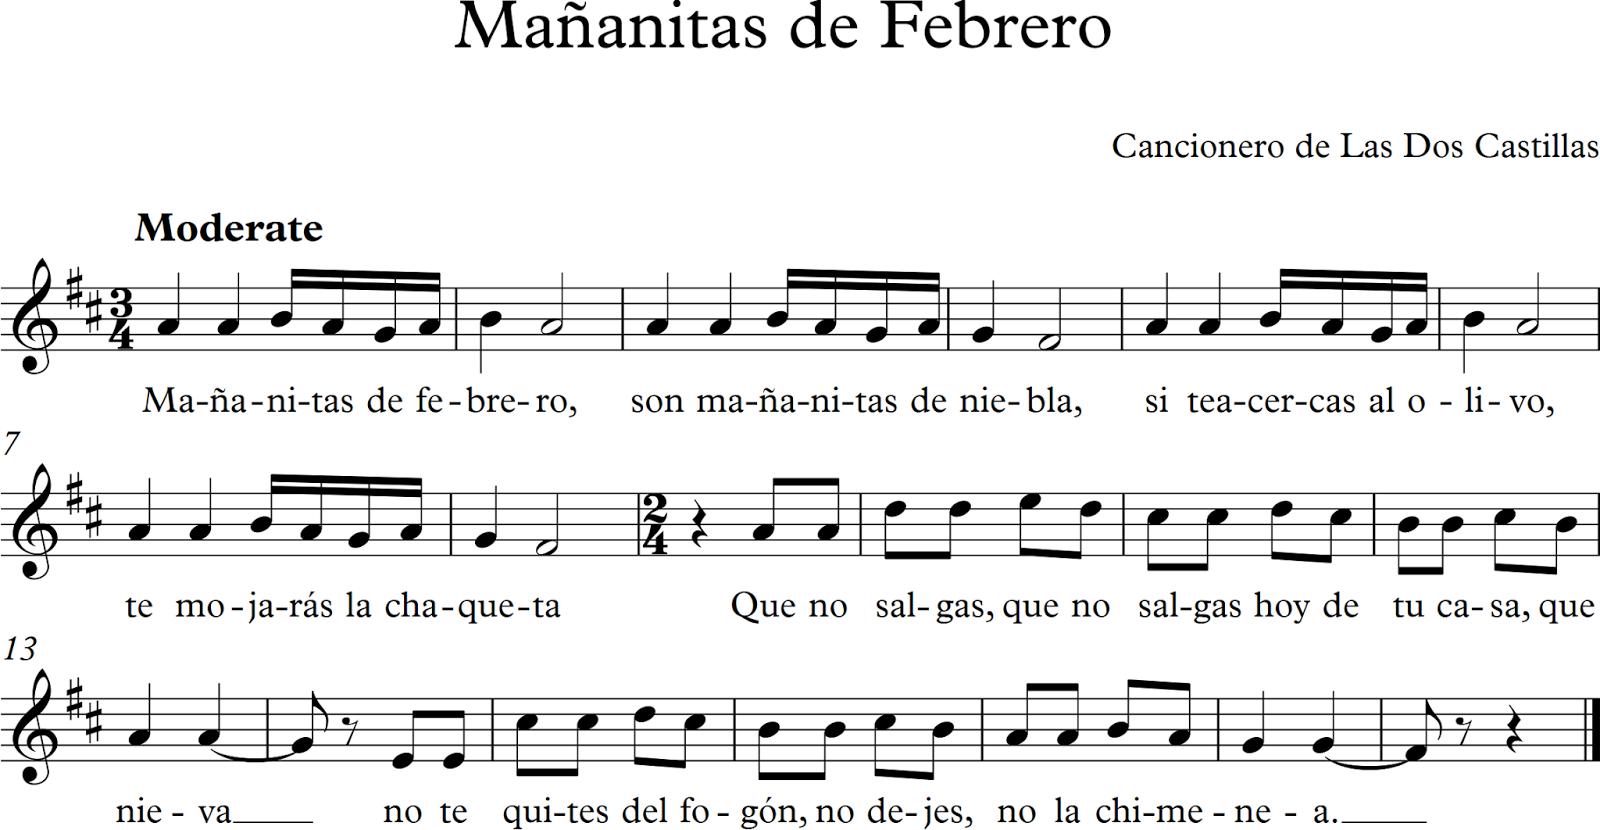 Descubriendo La Música Partituras Para Flauta Dulce O De Pico